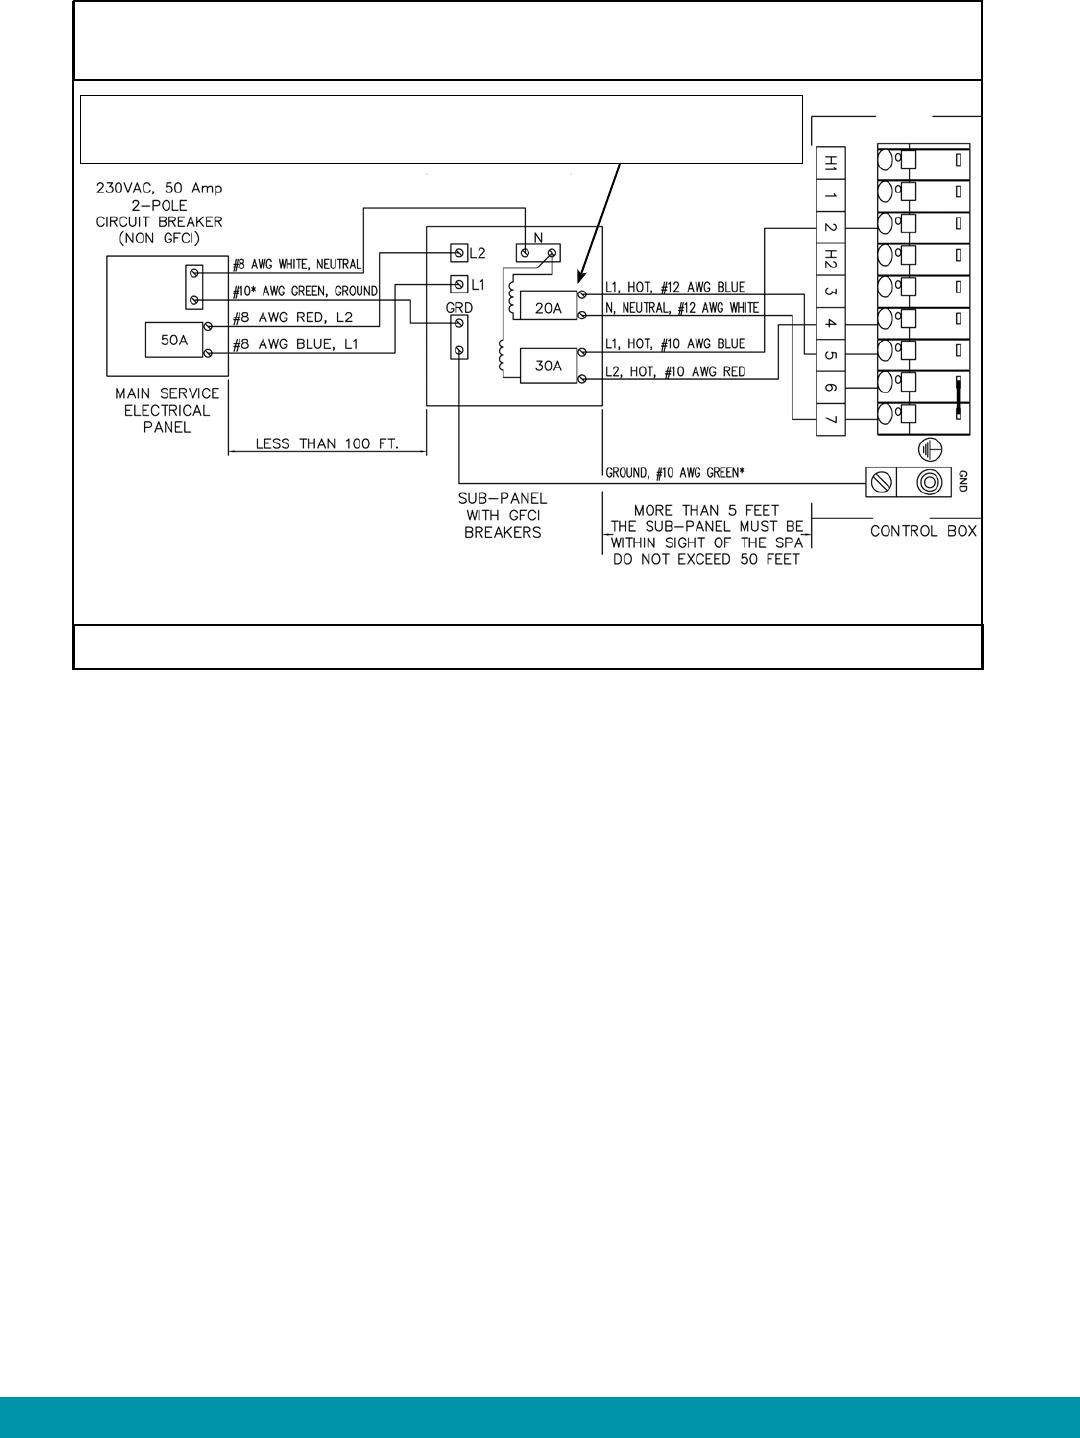 Handleiding Hot Spring Vanguard Vv Pagina 37 Van 48 English Gfci No Ground Wiring Diagram Page